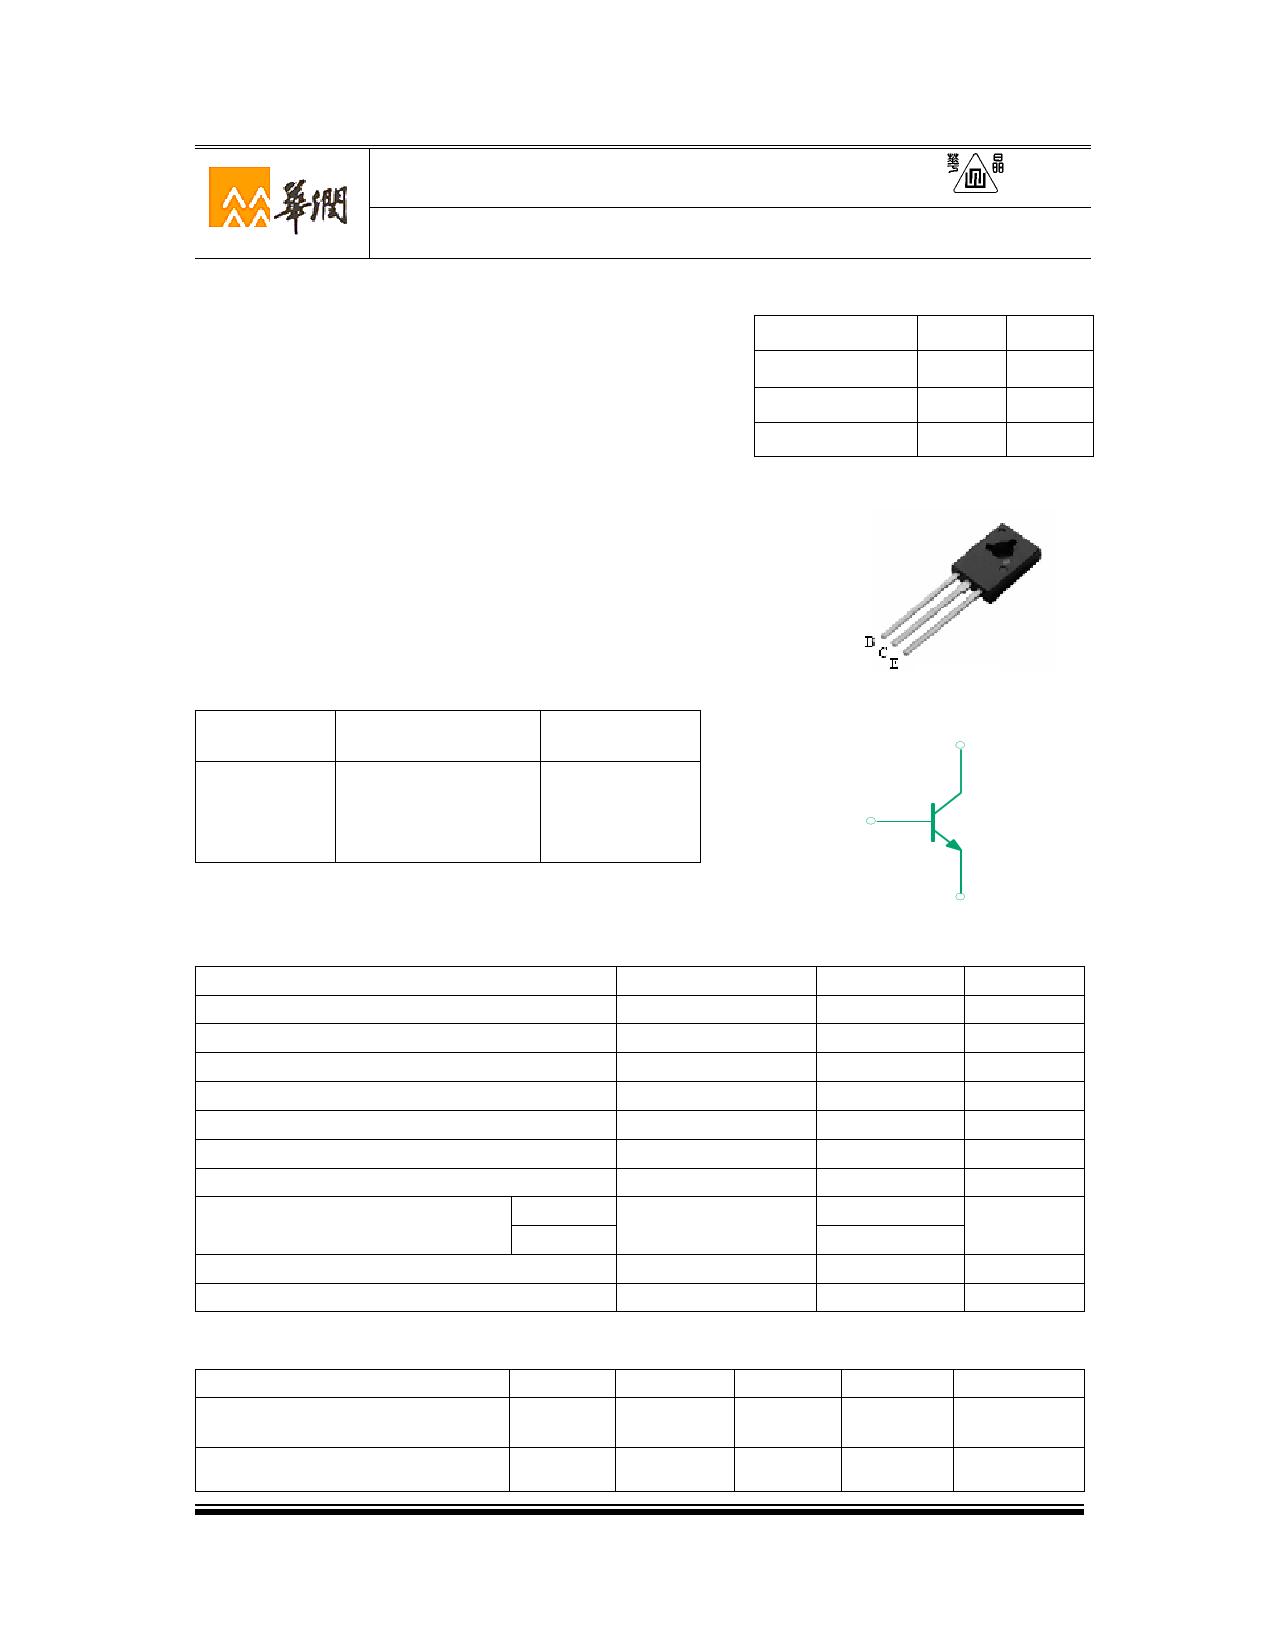 3DD13003K6 Datasheet, 3DD13003K6 PDF,ピン配置, 機能